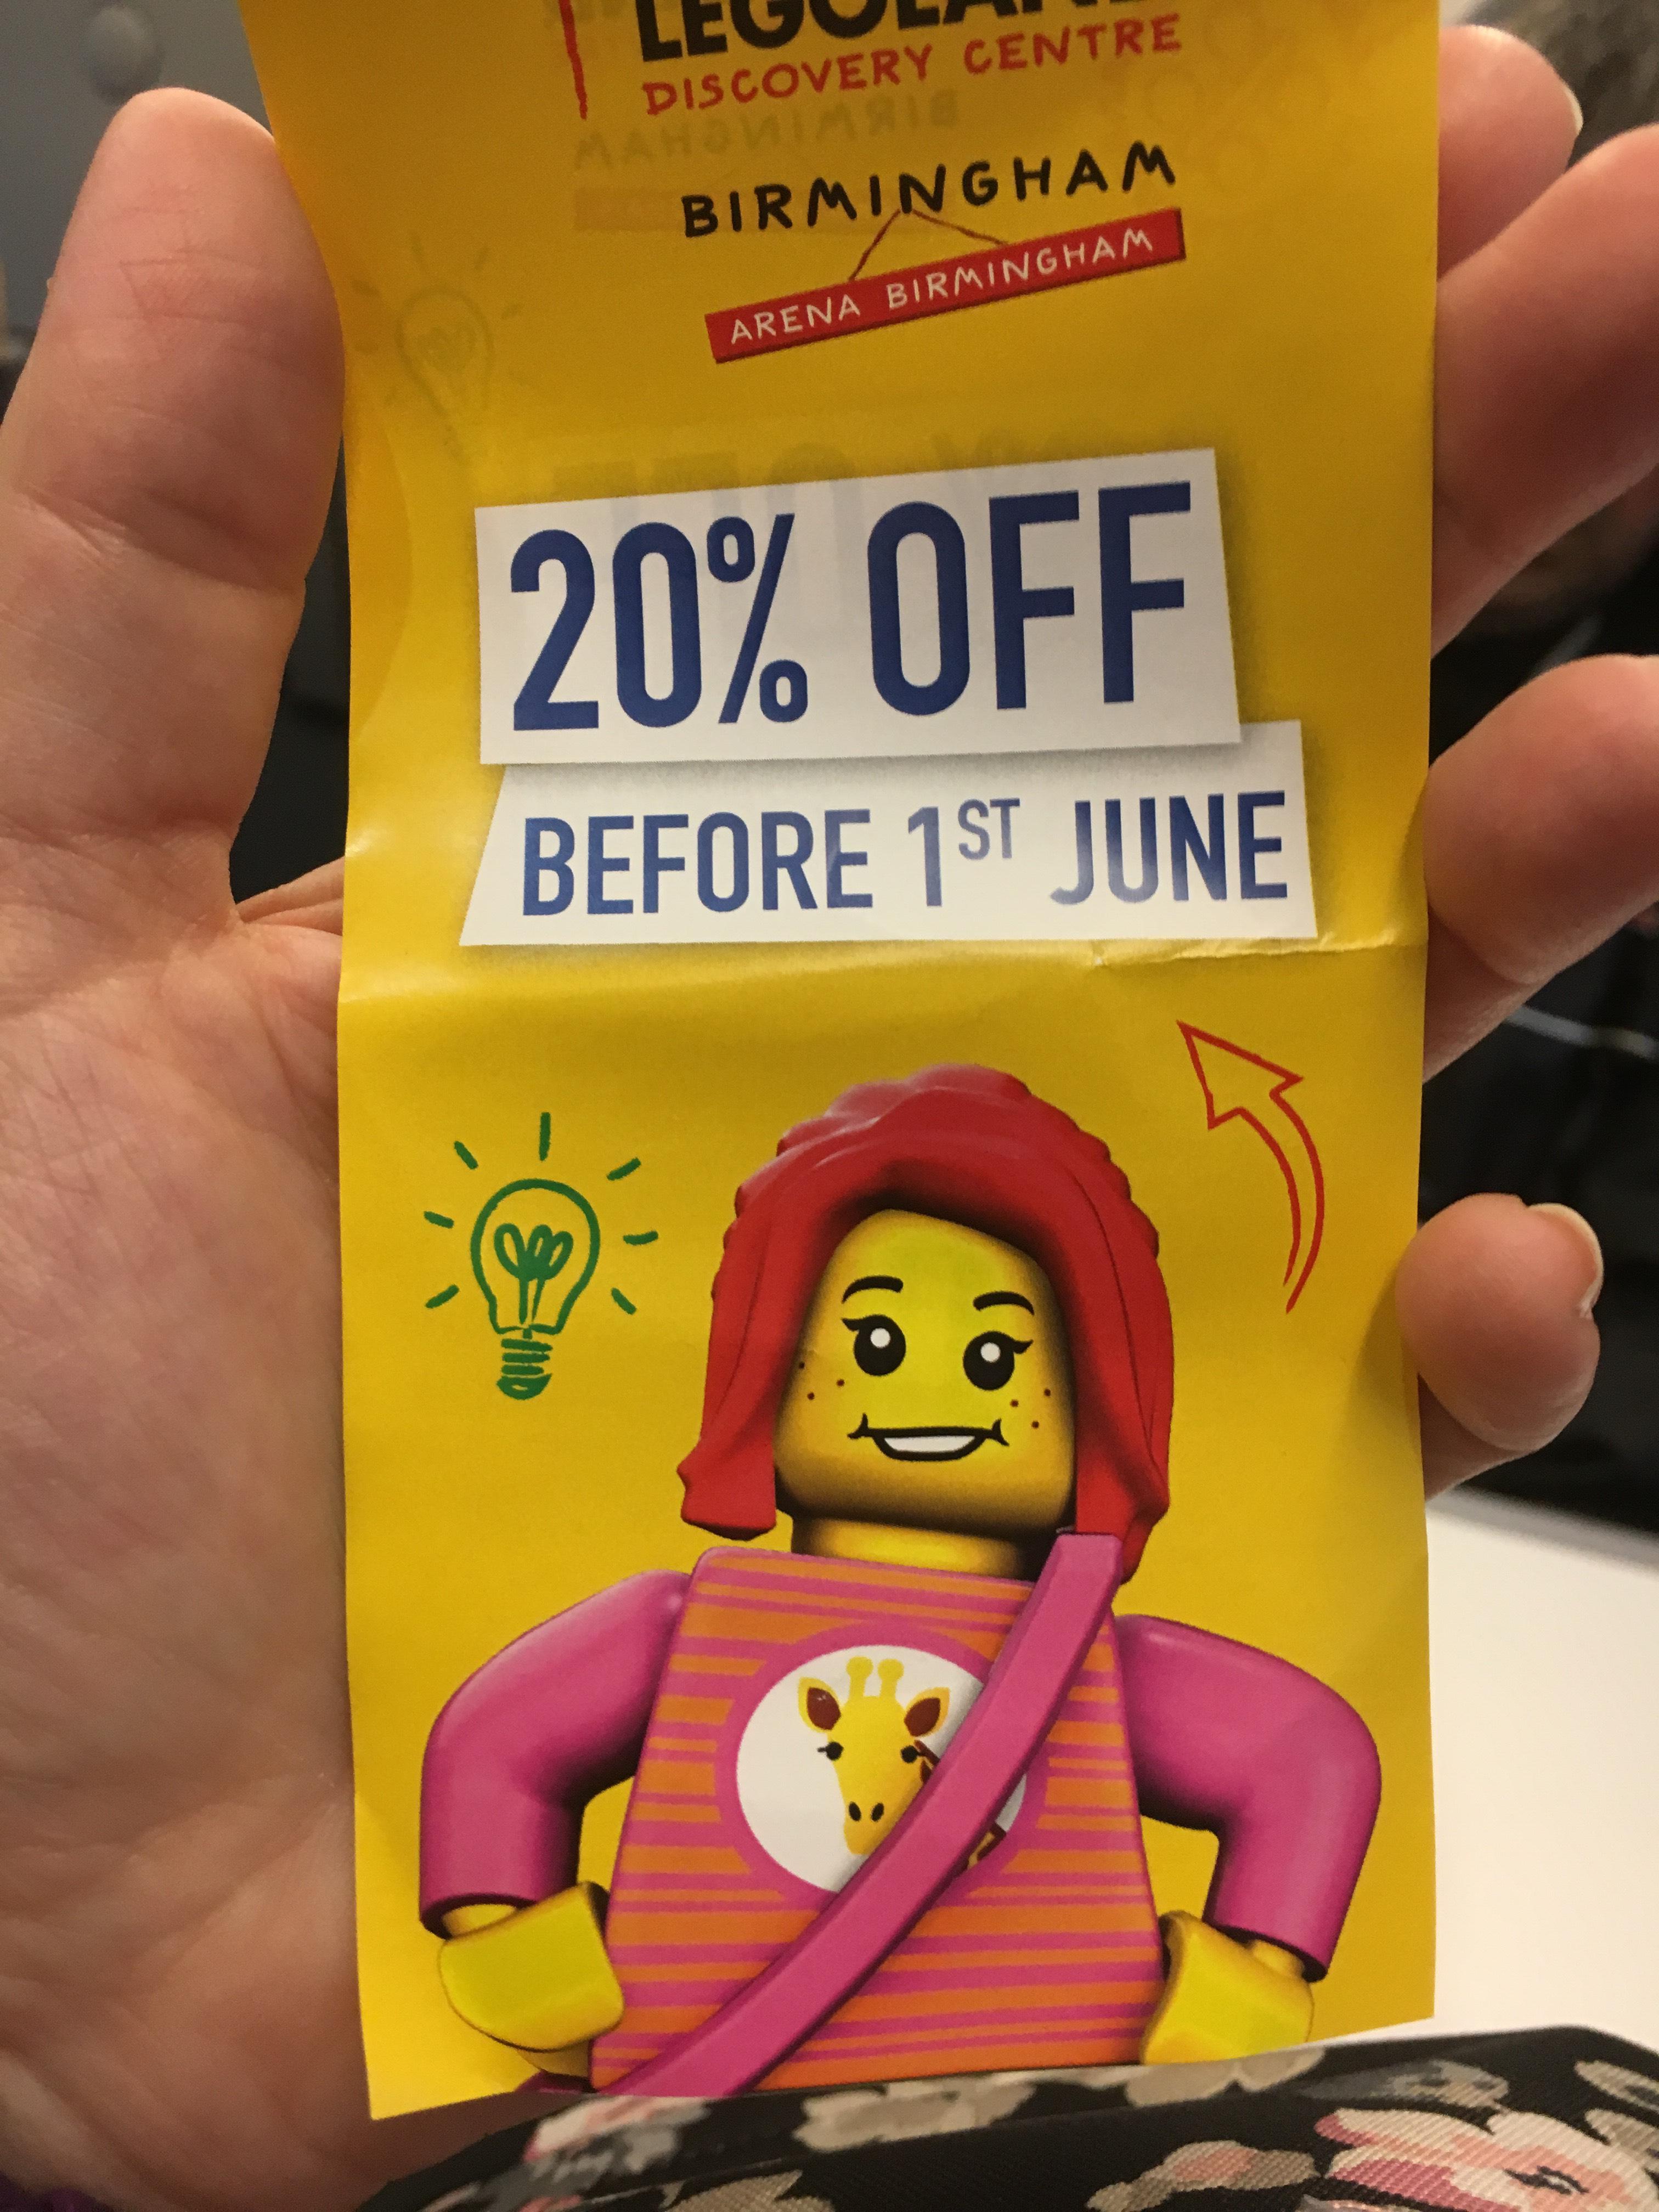 20% off Legoland Birmingham till June 1st